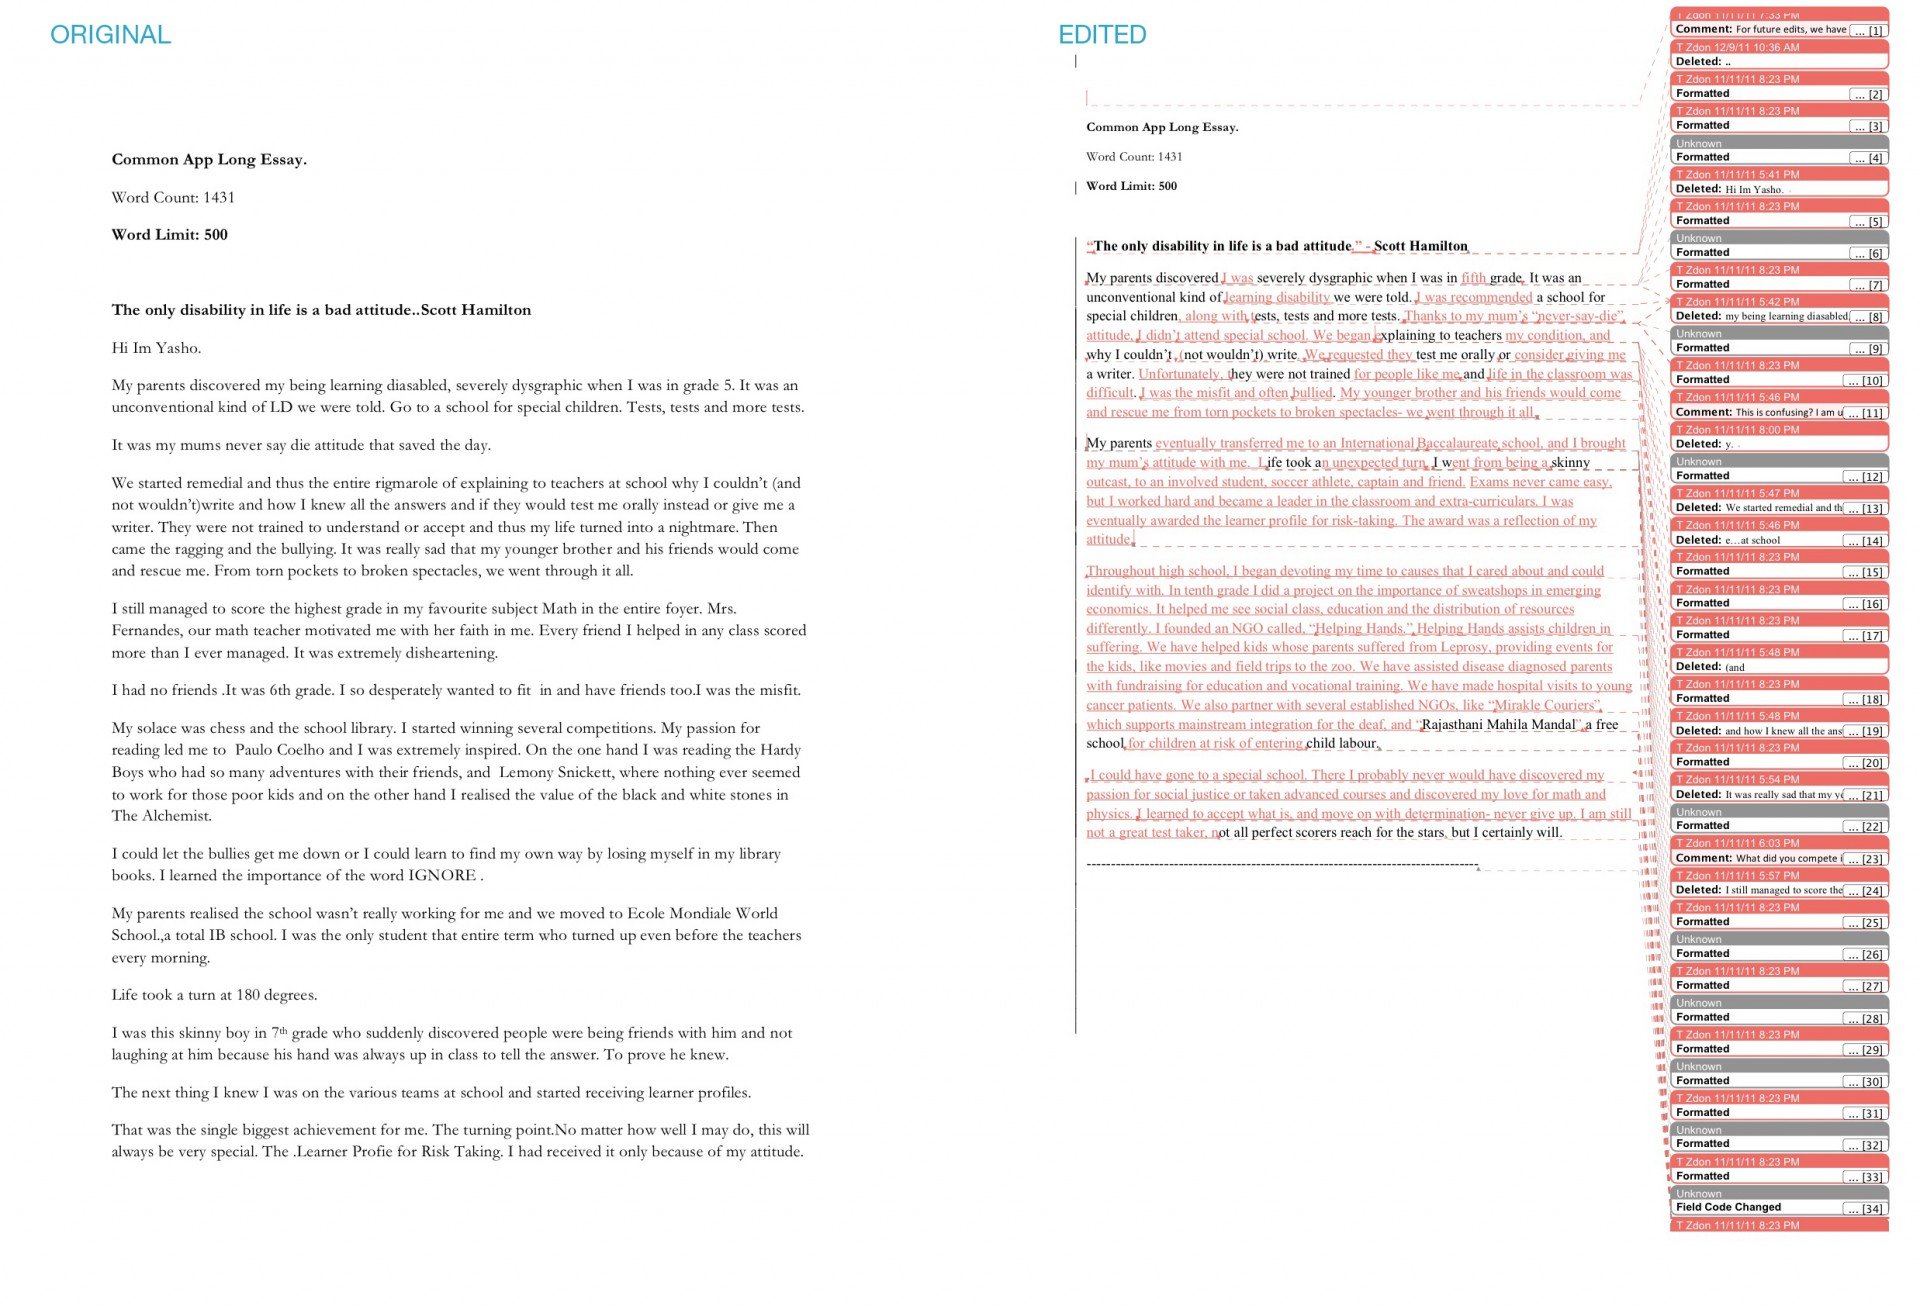 011 Vmca6ux3d2 How Many Common App Essays Do You Write Essay Amazing Should 1920